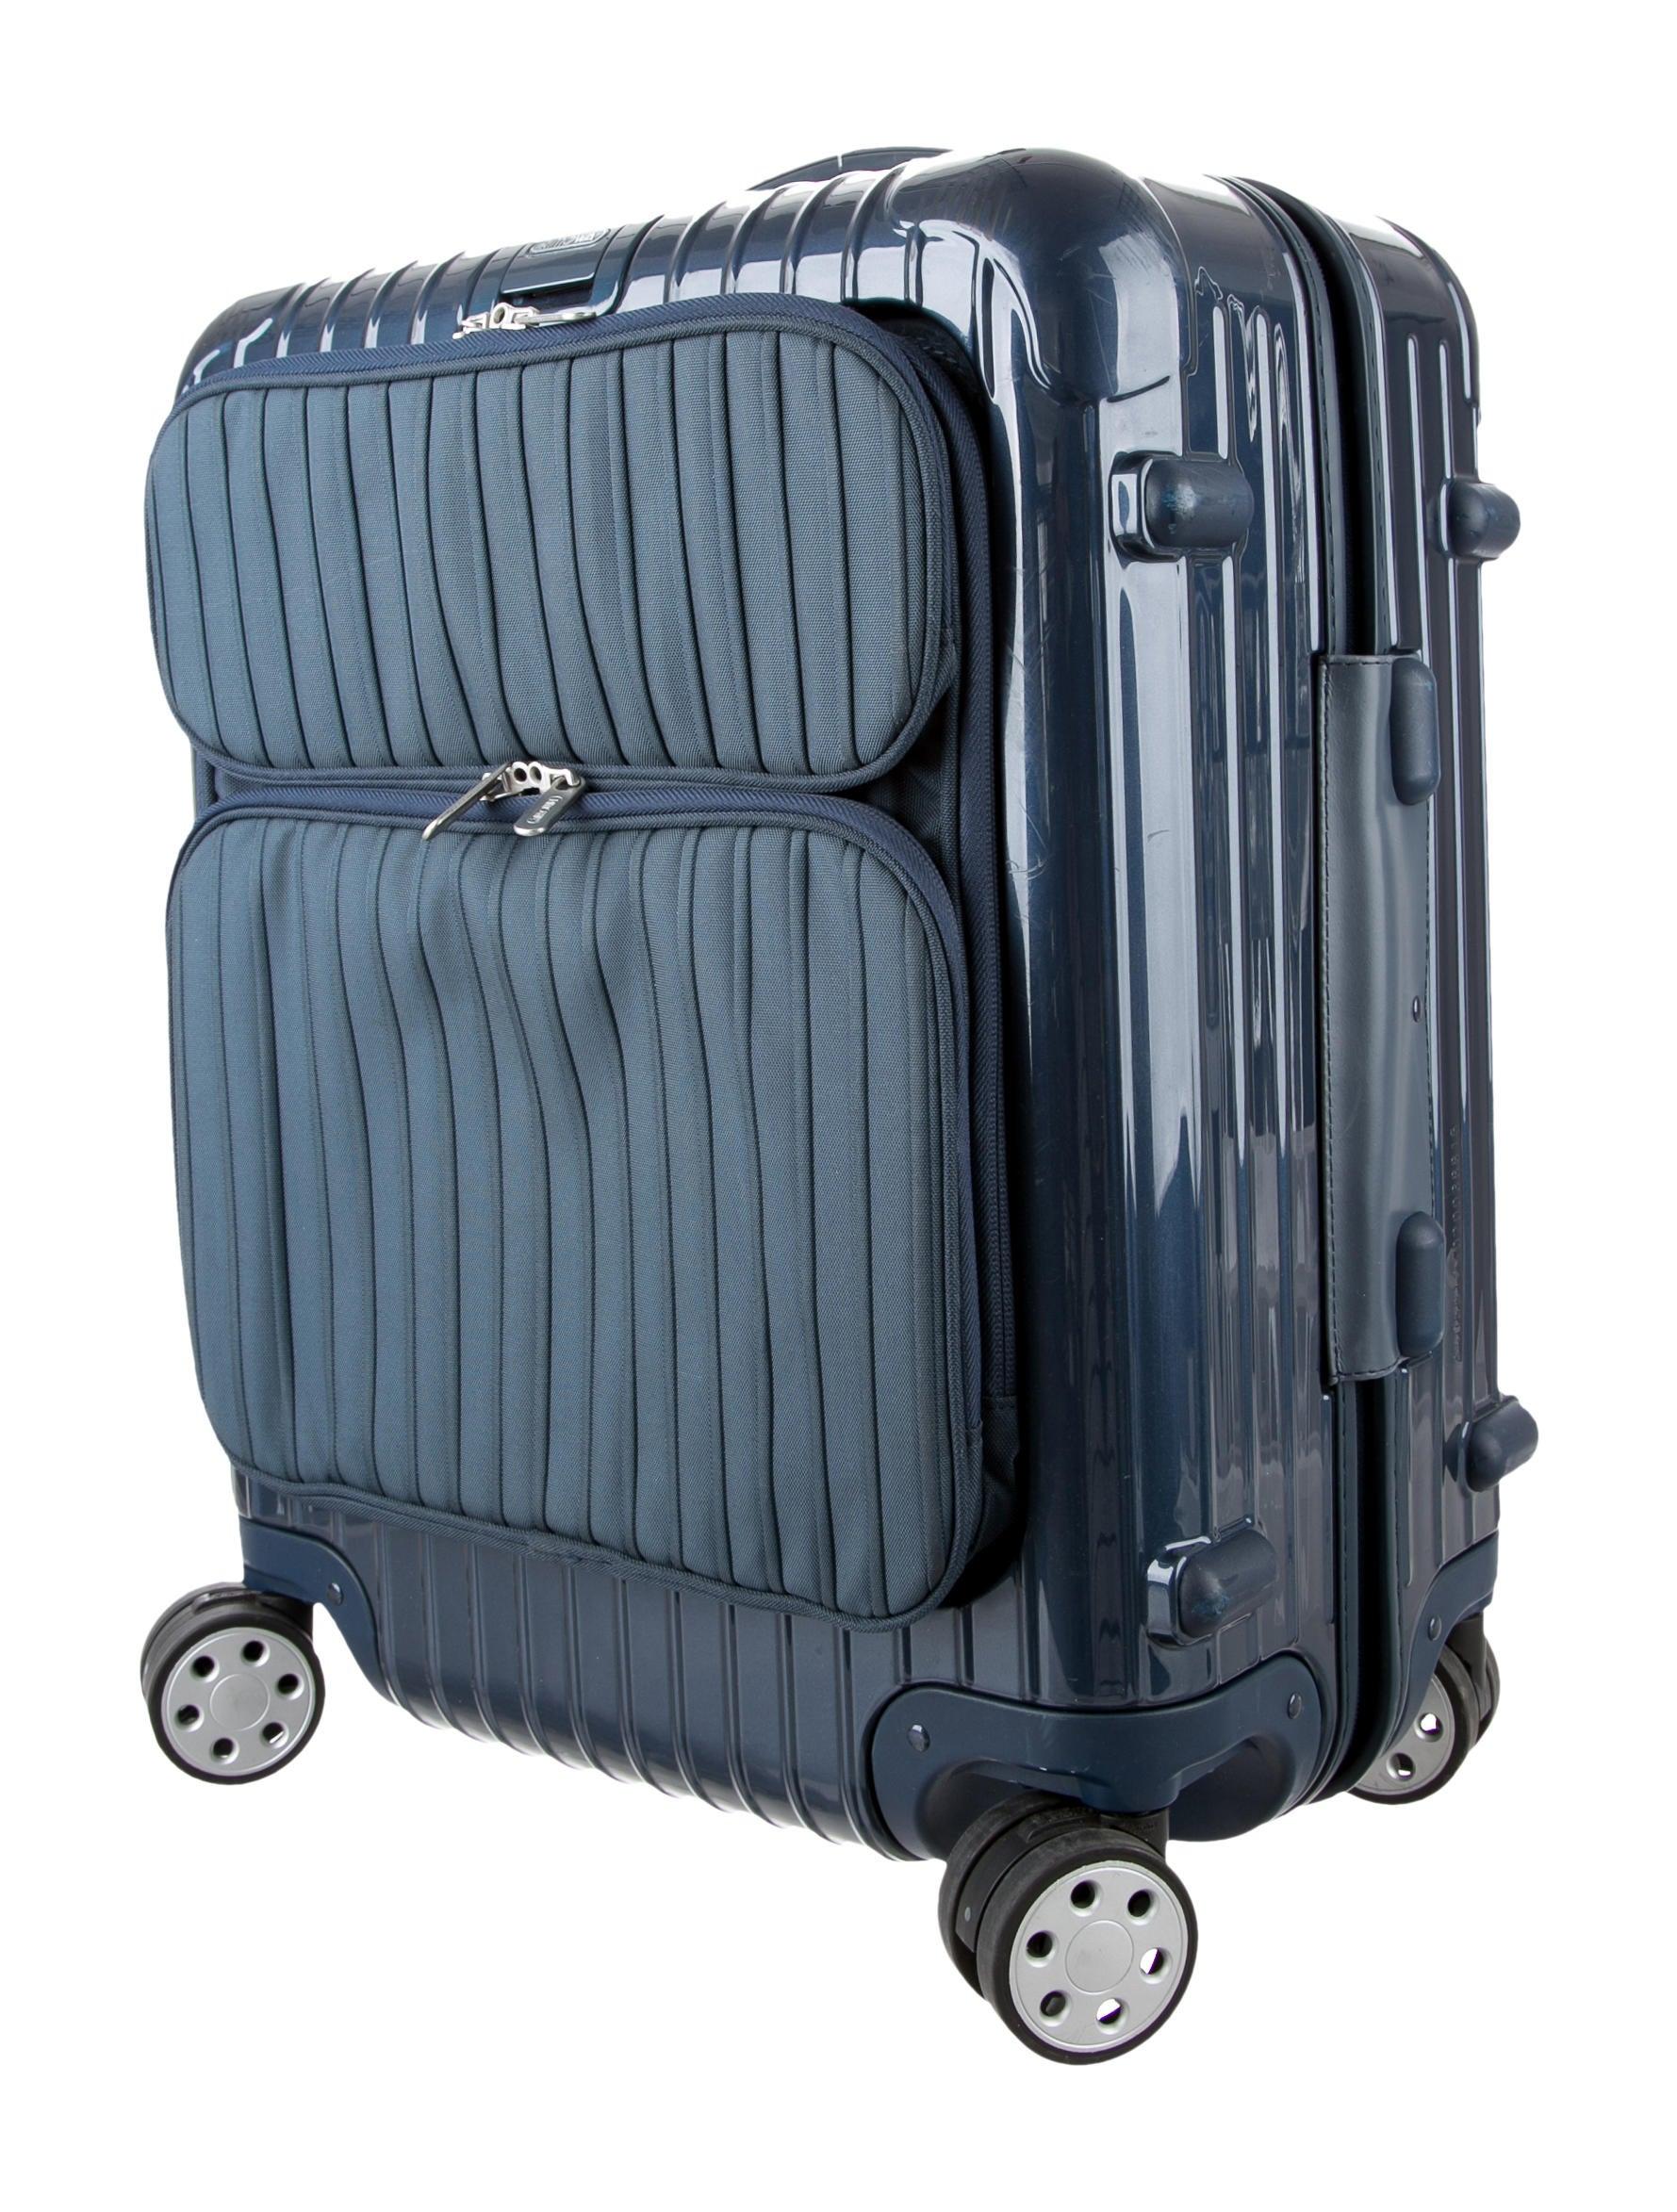 rimowa salsa deluxe hybrid suitcase luggage rwa20069. Black Bedroom Furniture Sets. Home Design Ideas